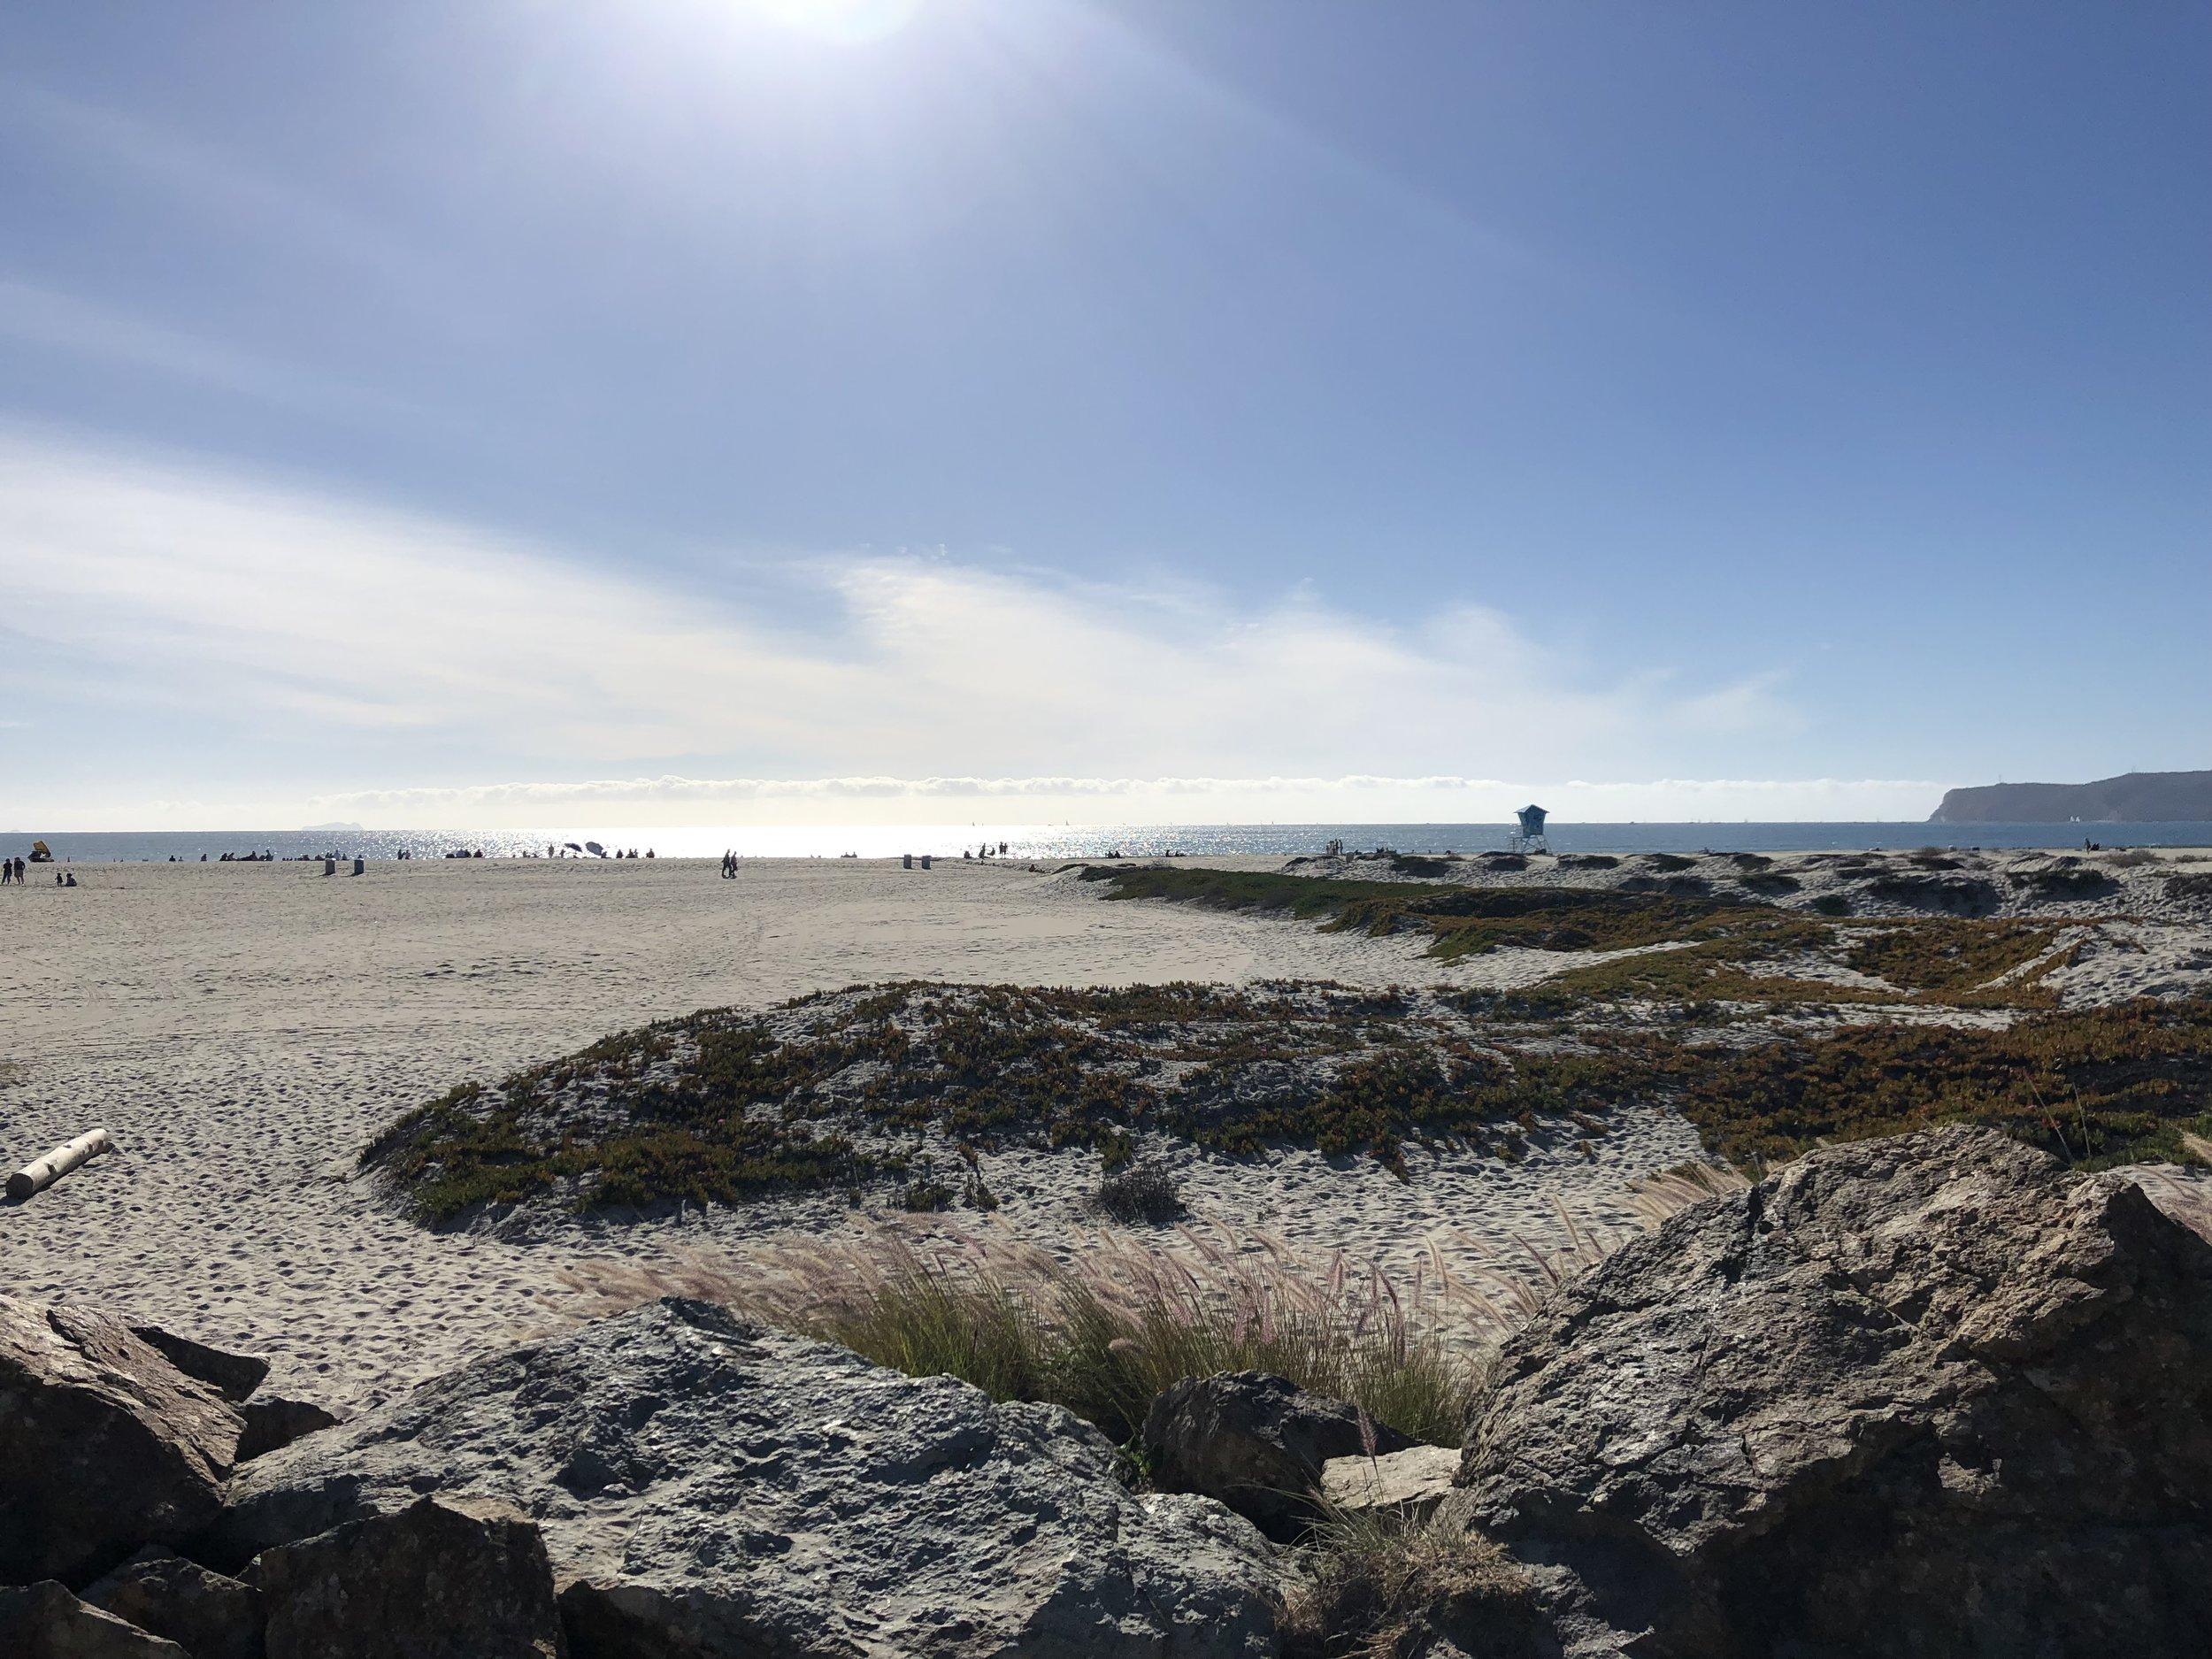 Coronado Beach on meethaha.com